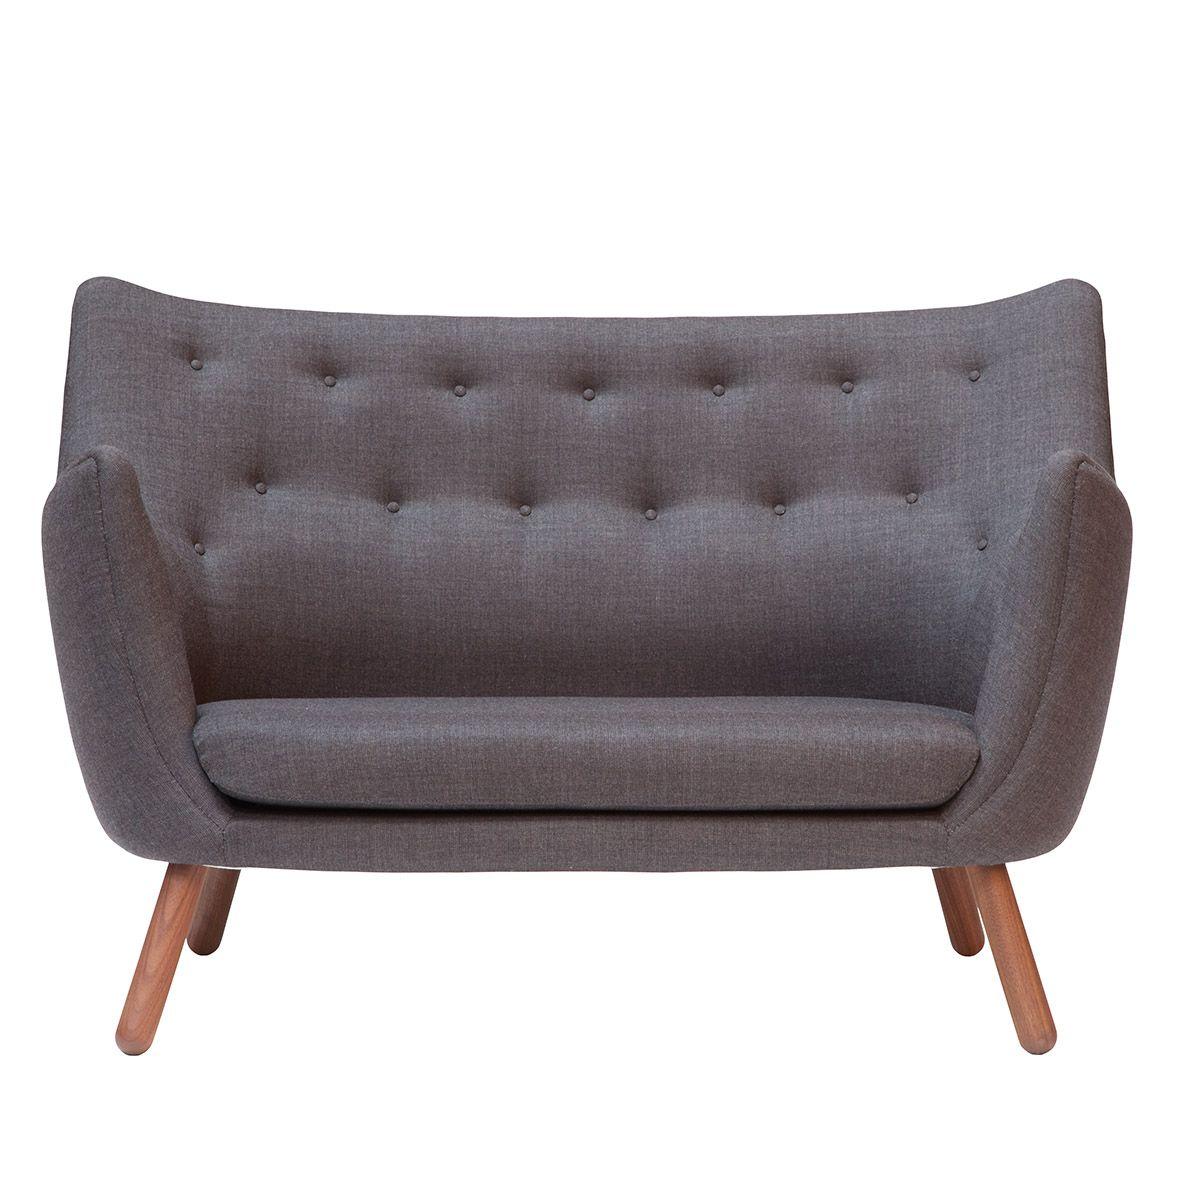 finn juhl poet sofa sale friheten corner bed slipcover sofá poeten 1941 el mueble del siglo xx